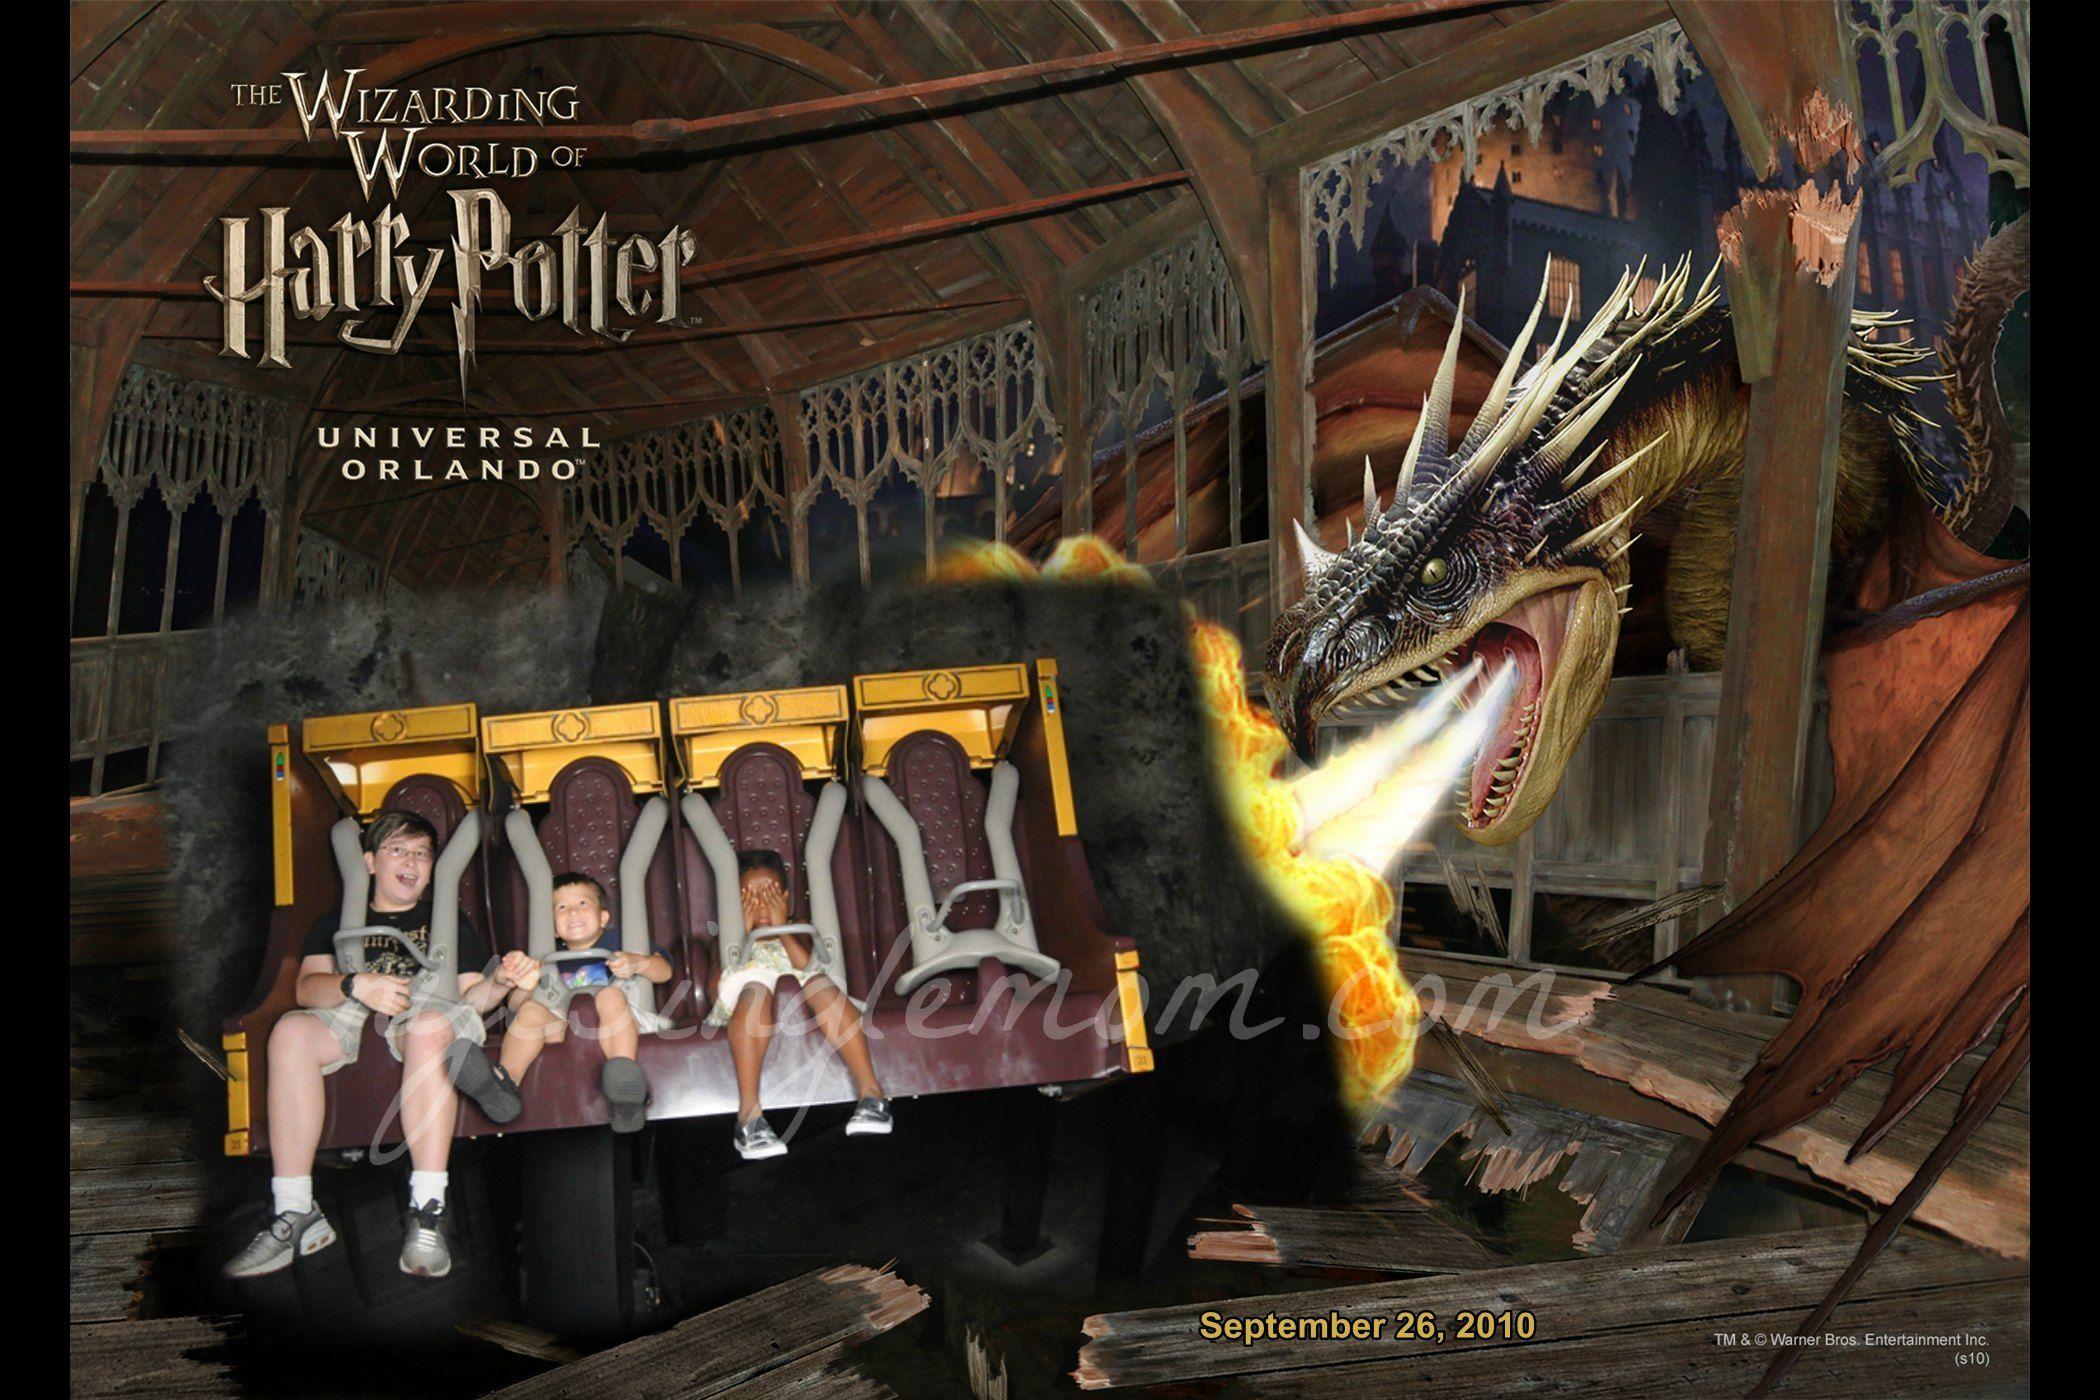 Harry Potter Ride Universal Studios Florida Universal Orlando Universal Studios